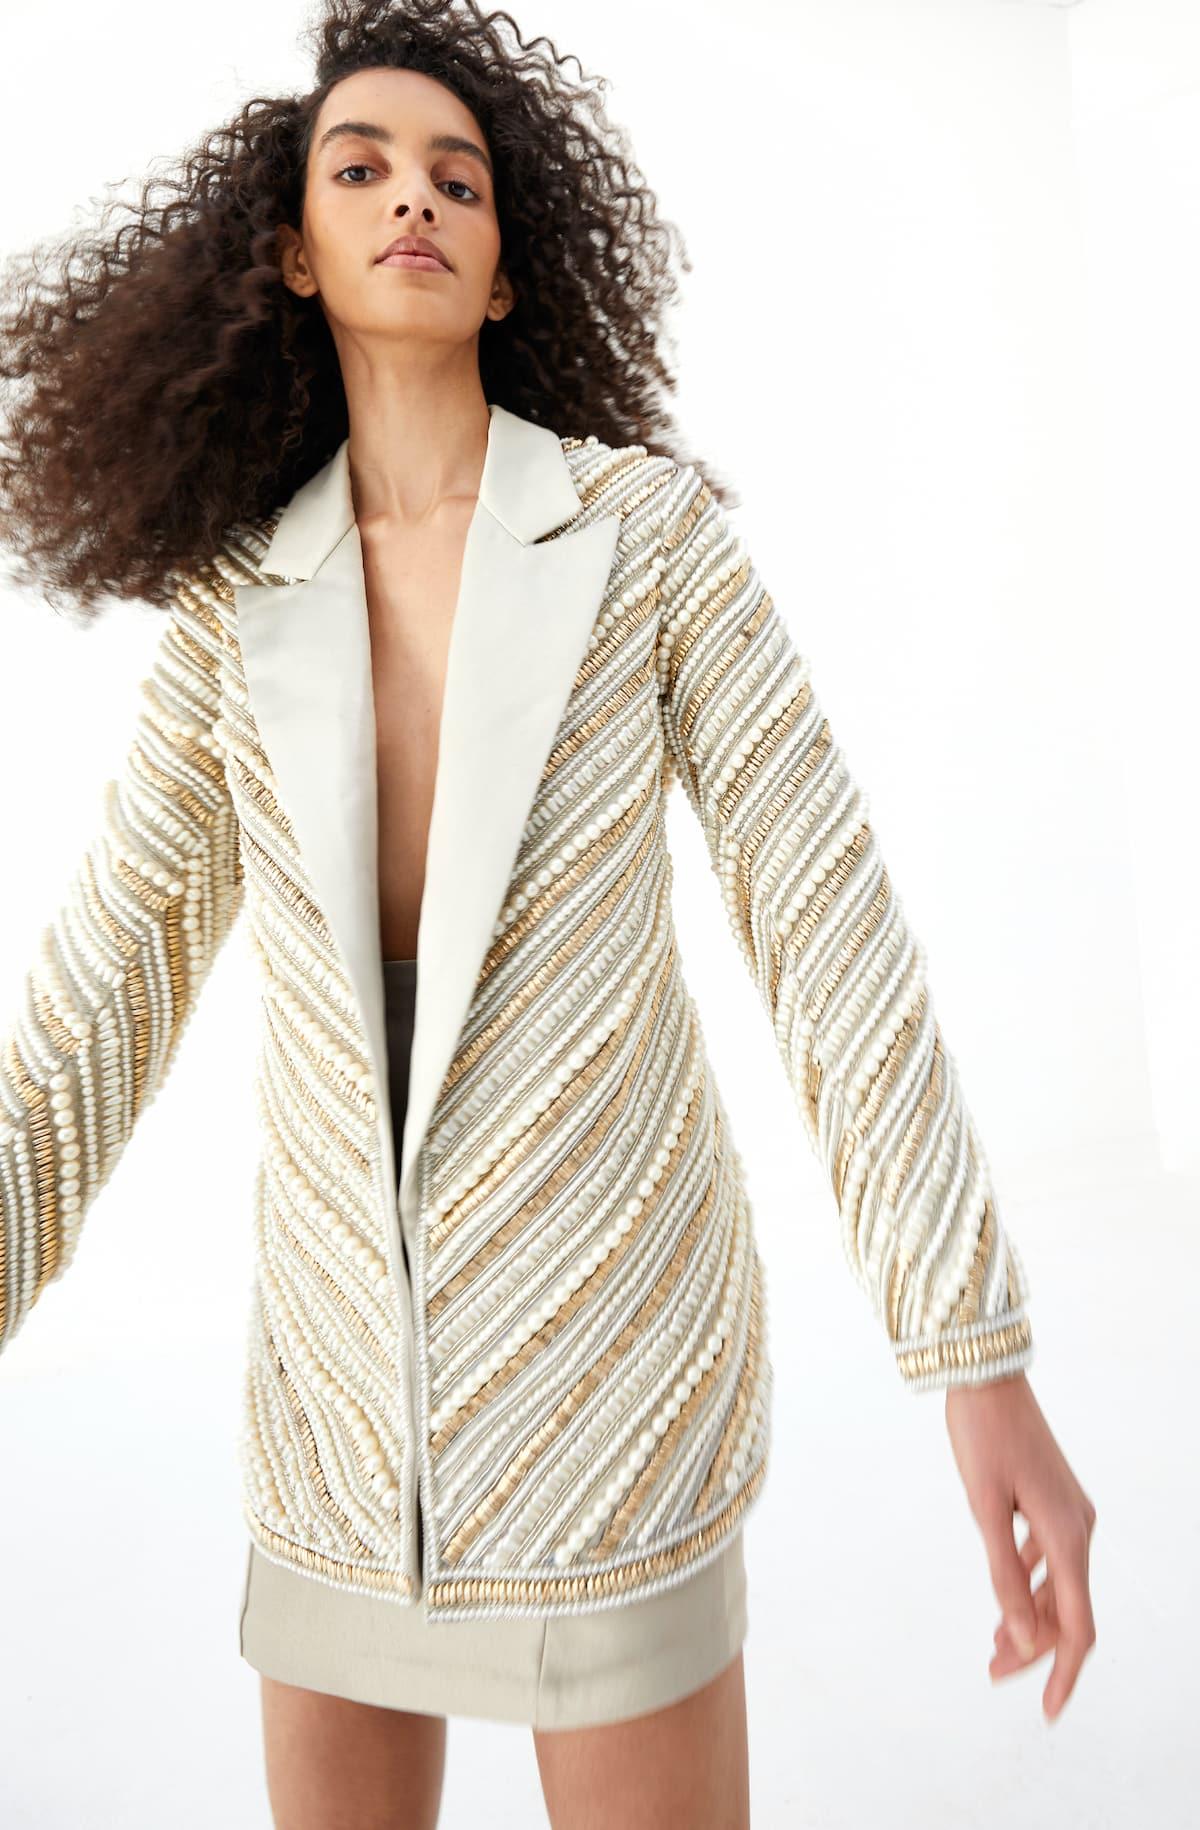 View 2 of model wearing Kasira Blazer in pearl gold.